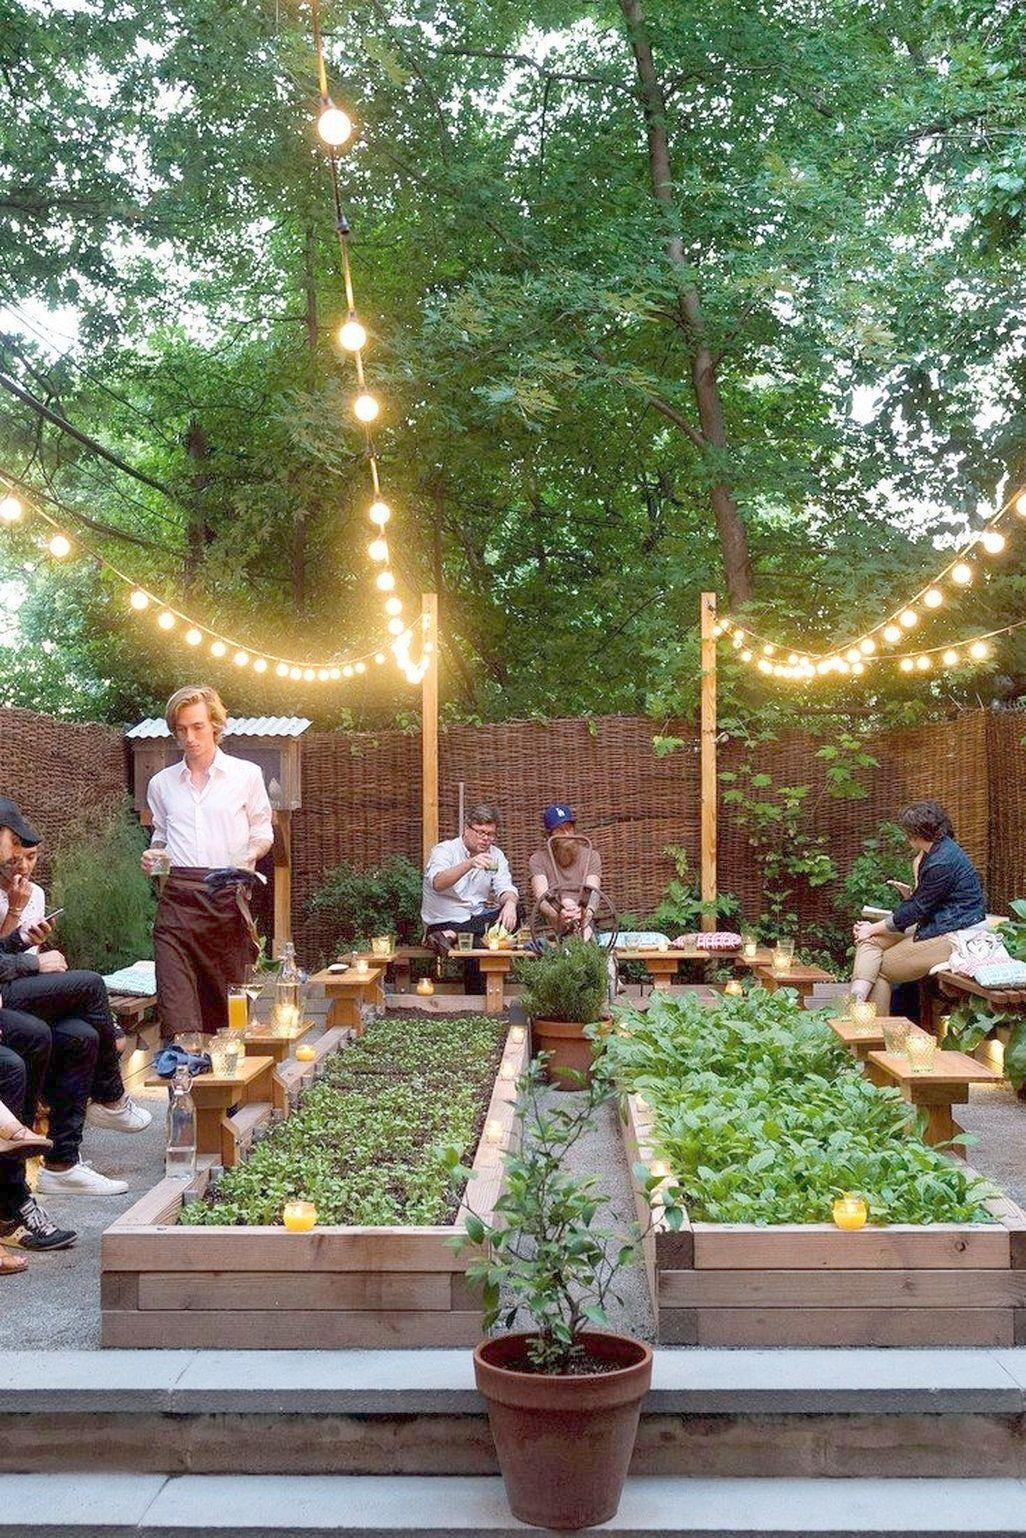 Urban Gardening Conference Along With Urban Gardening Apartment Little Tropical Garden In 2020 Patio Garden Design Vegetable Garden Design Vegetable Garden Raised Beds